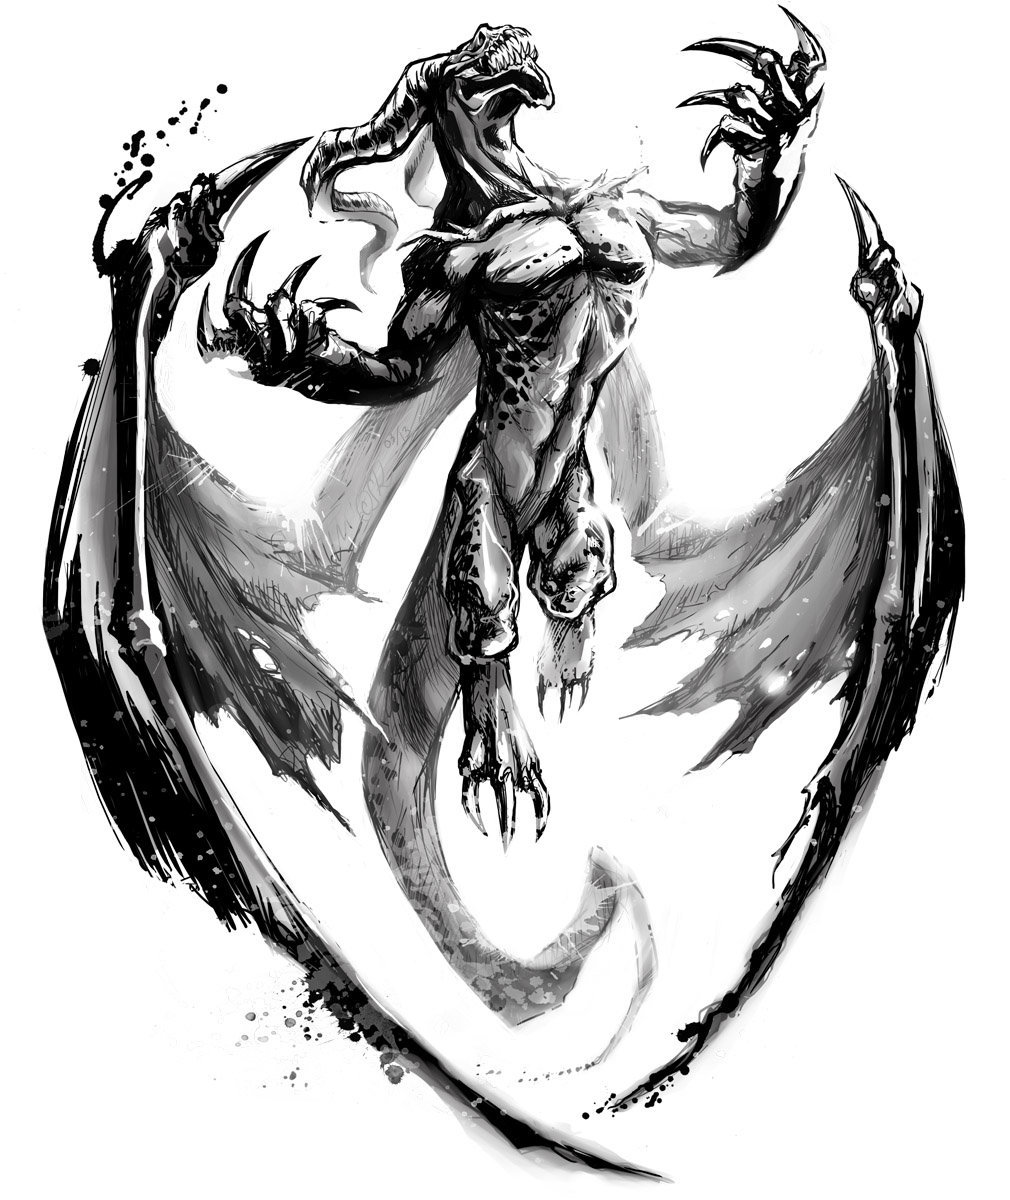 File:Gothic-tattoo-fosse-road.jpg - Wikipedia